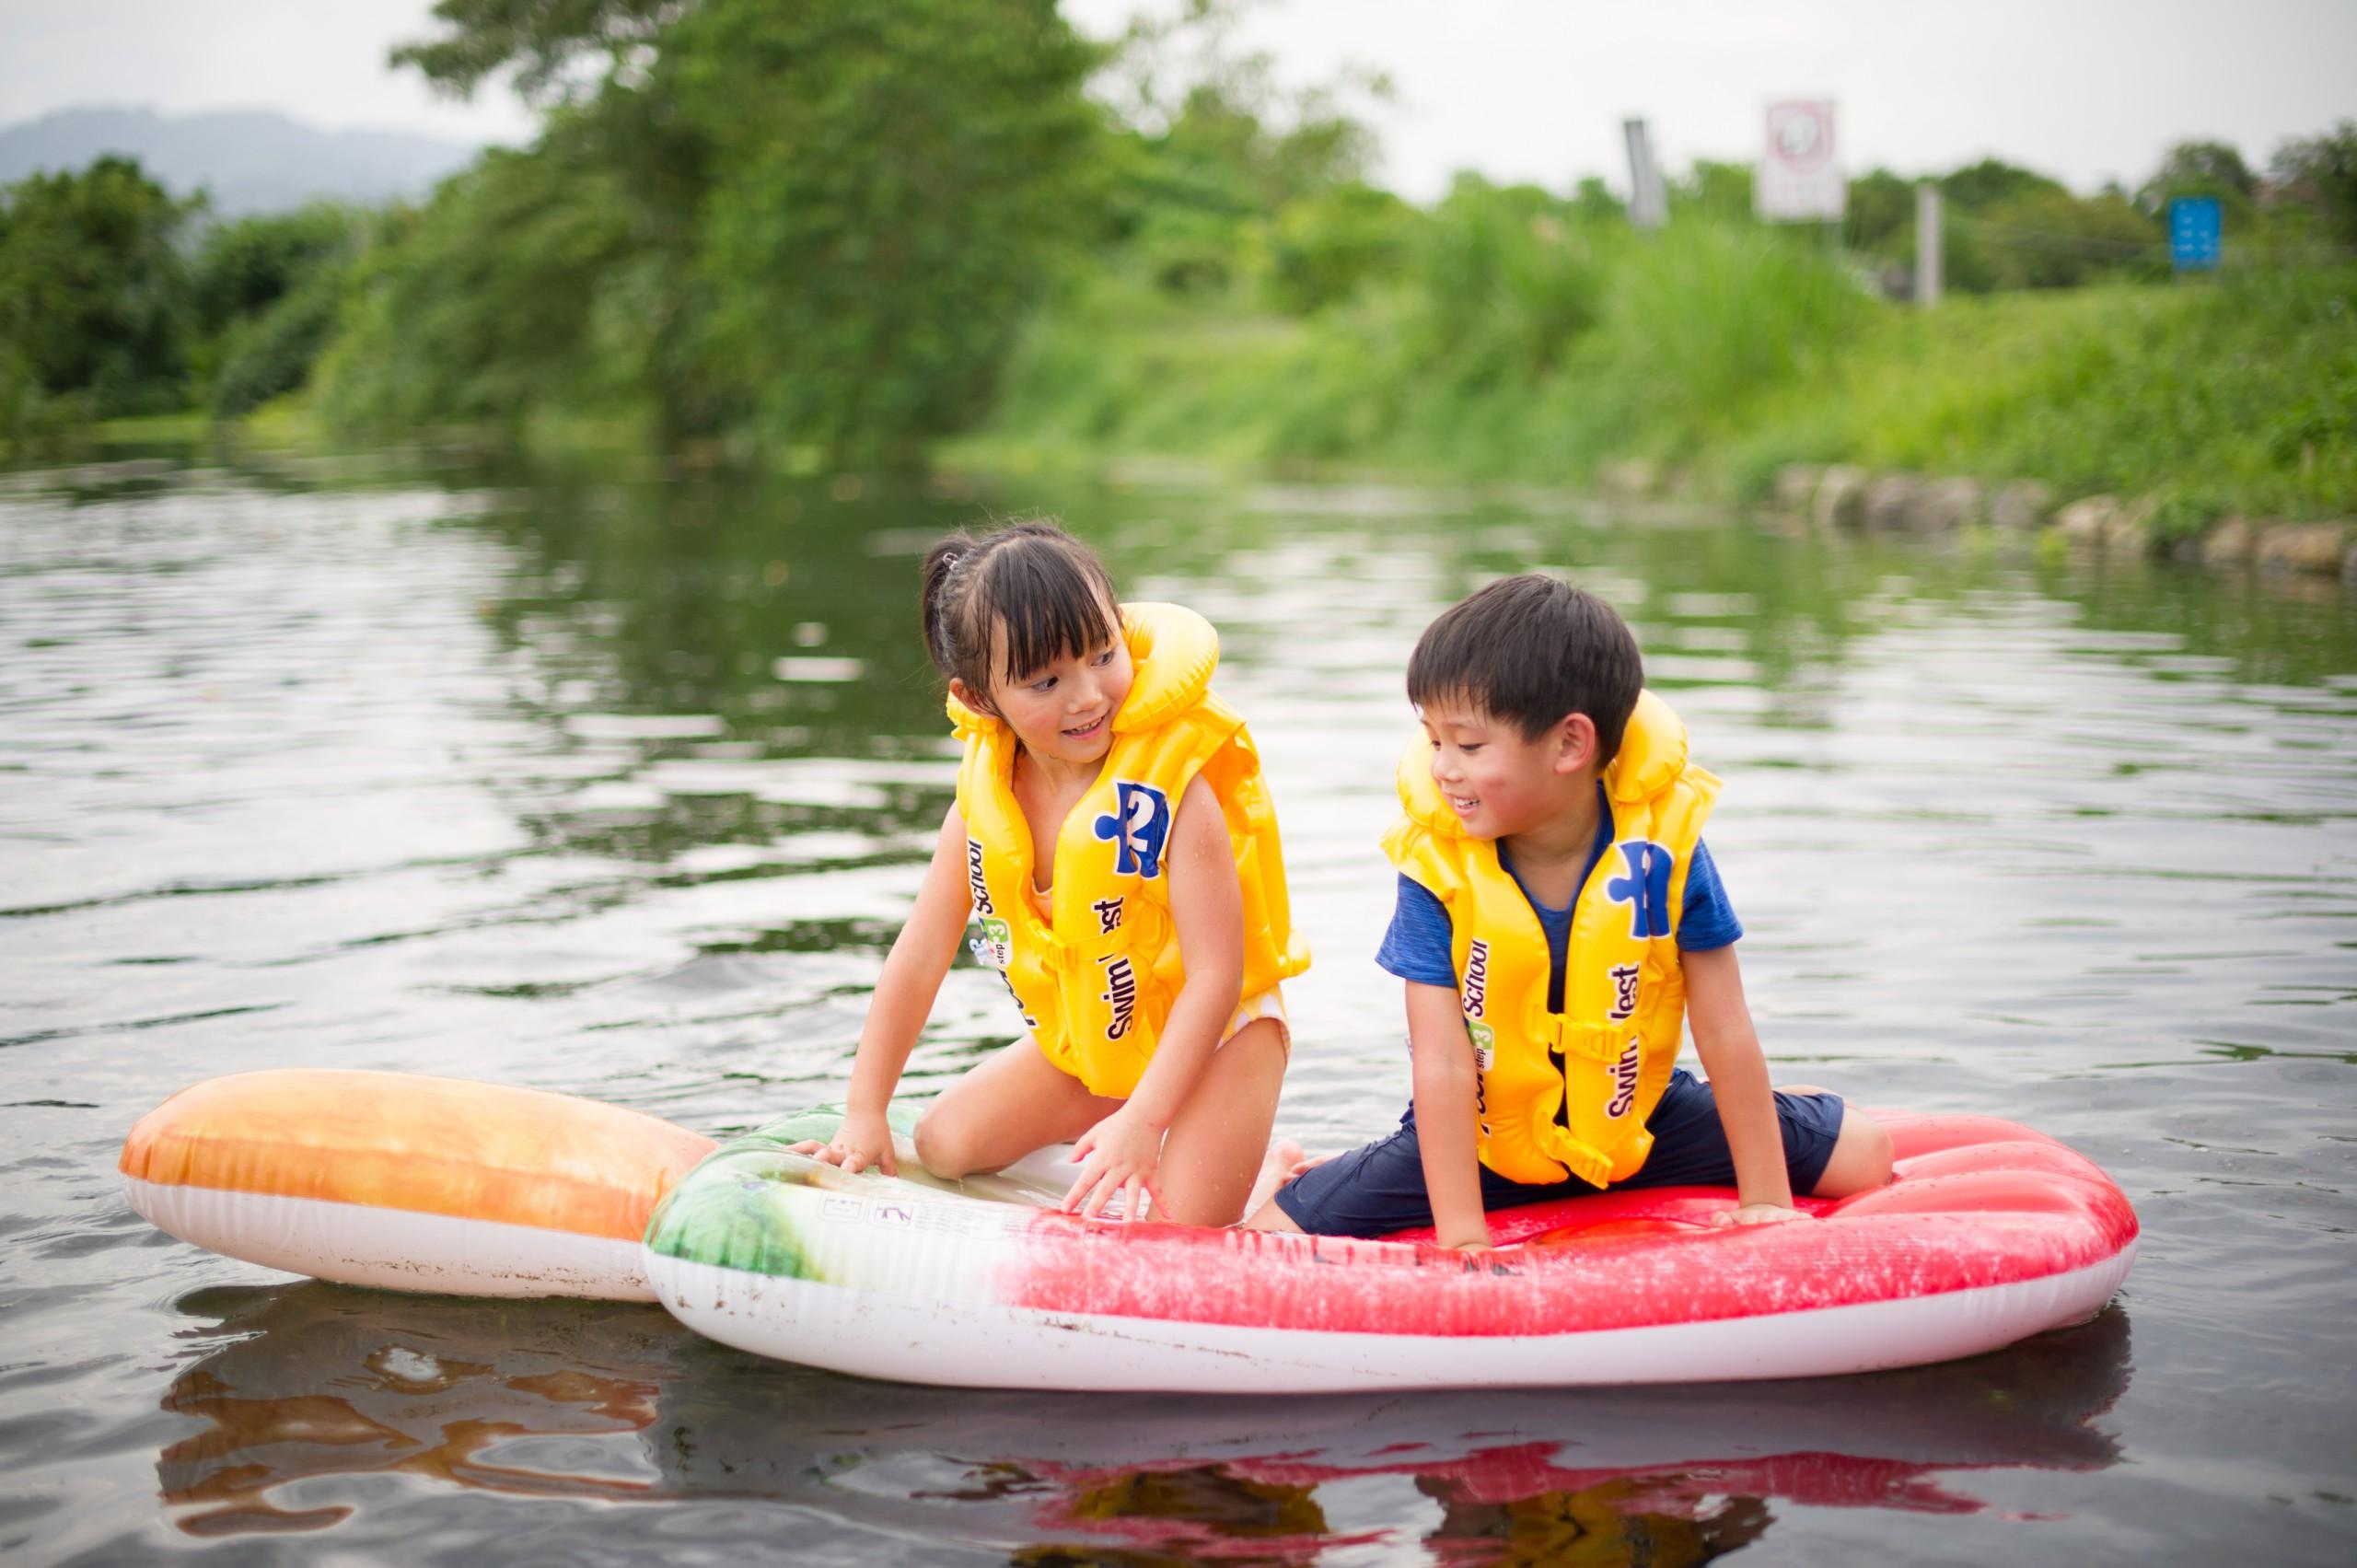 德築-DEZU-project-Fun3sport-inflatable-bed-lake-14